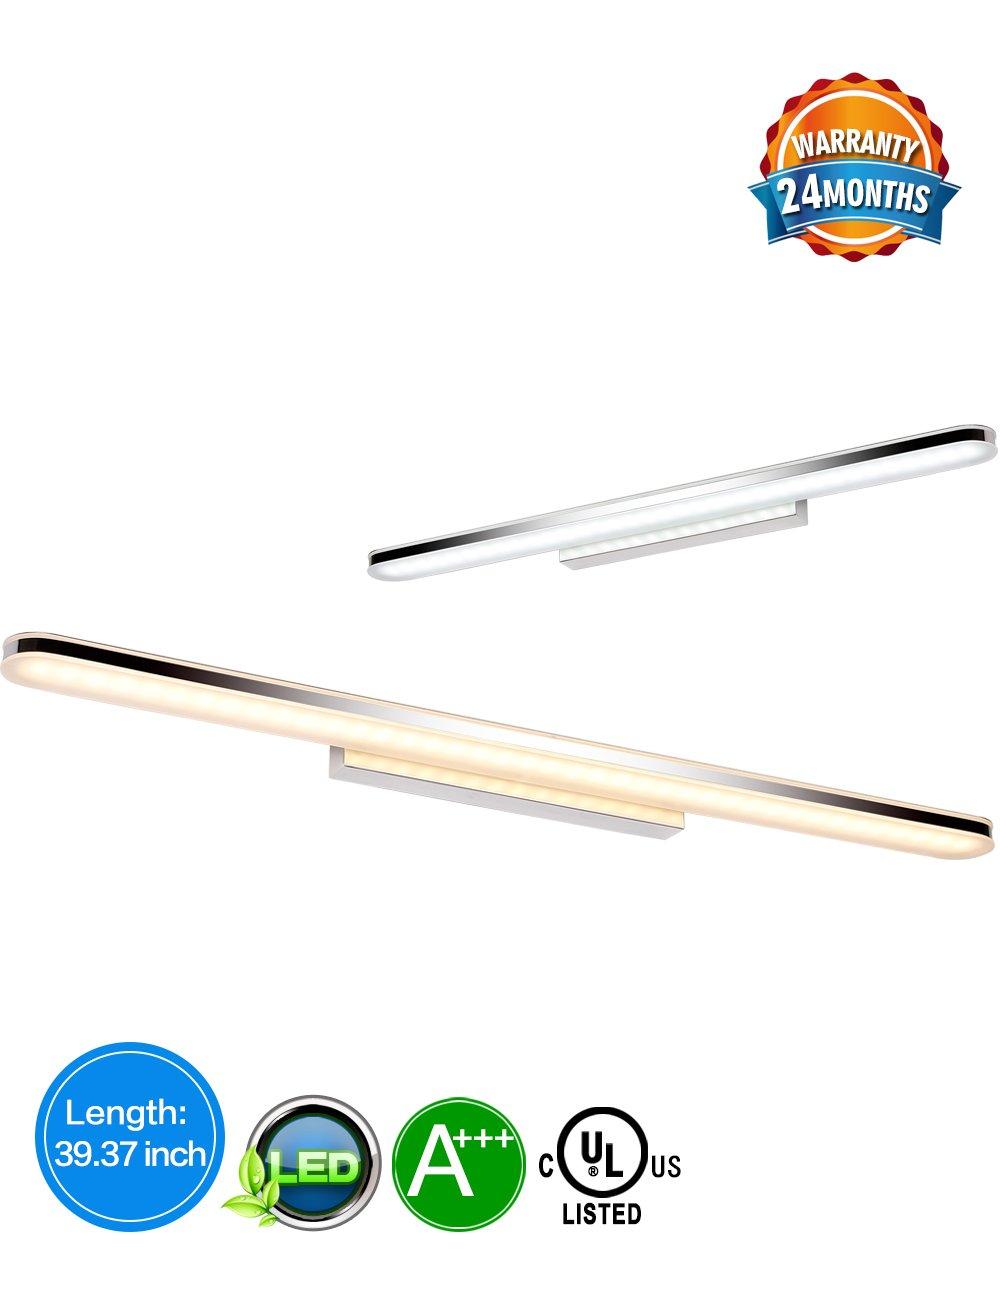 LED Bathroom Vanity Lighting Fixtures Long Shade Stainless Steel Bath Mirror Lamps WaLL Lights